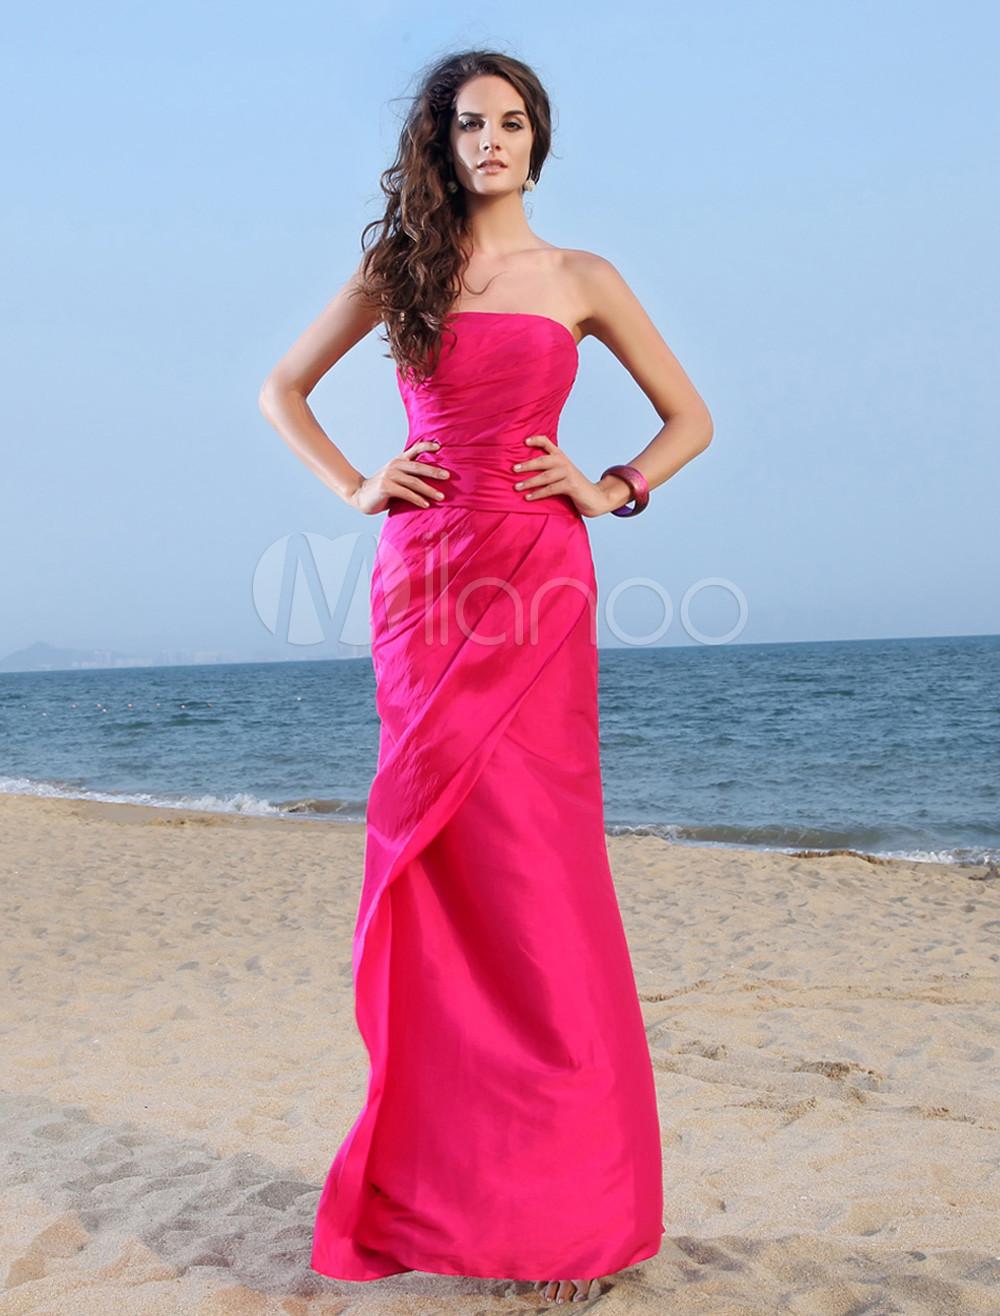 5587ecf606 Hot Pink Evening Dress Taffeta Strapless Formal Dress Ruched Floor Length  Long Prom Dress - Milanoo.com